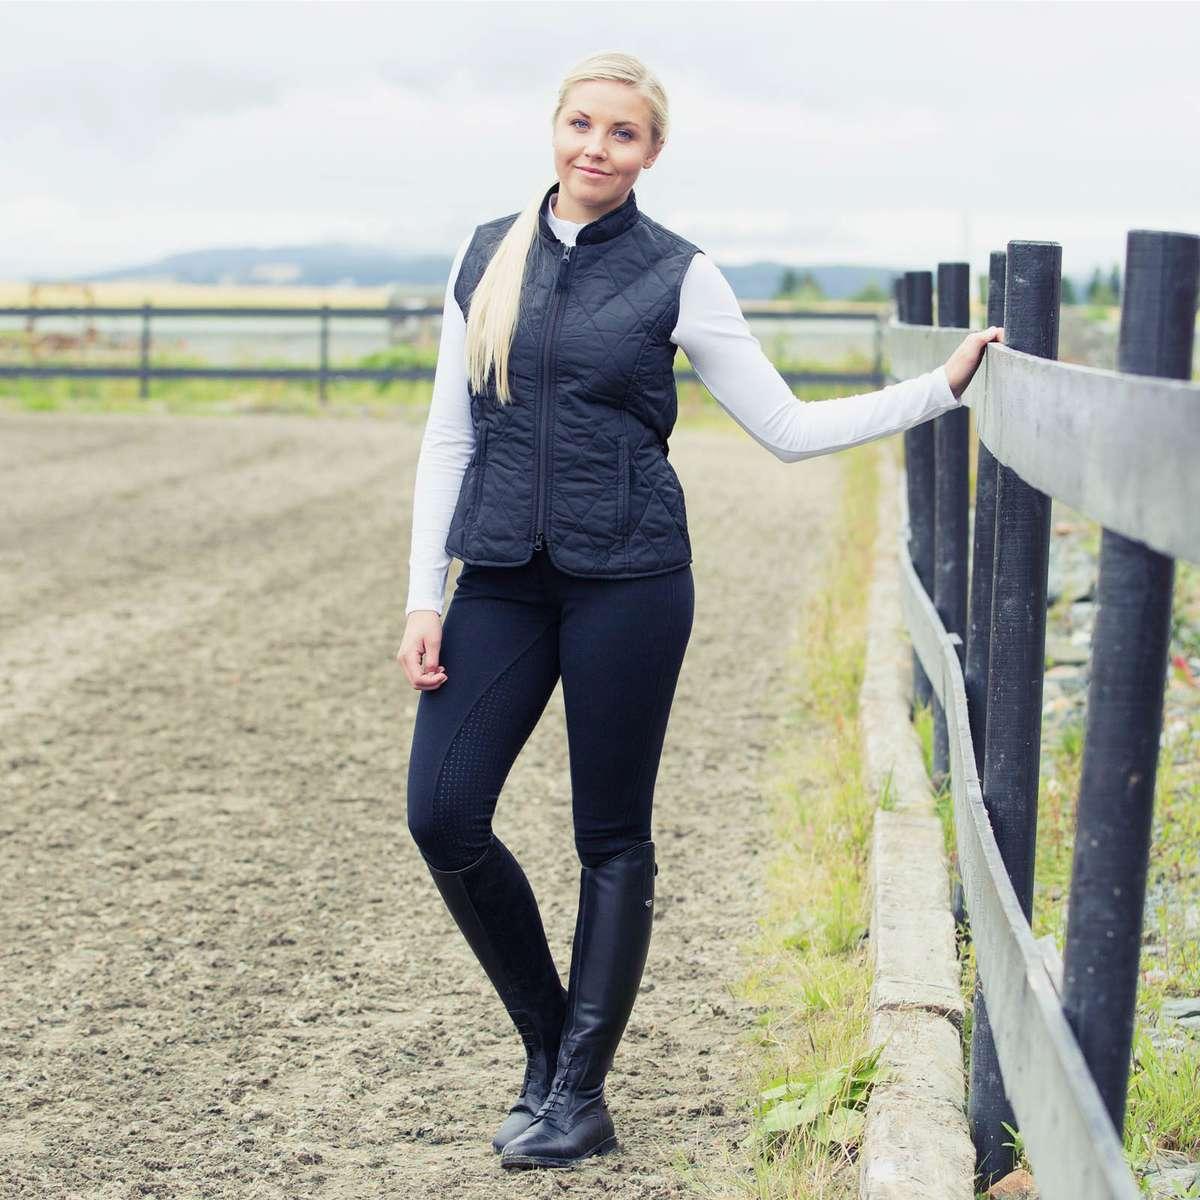 Horze-Women-039-s-Active-Silicone-Grip-Full-Seat-Riding-Breeches-Elastic-Leg-Bottoms thumbnail 34